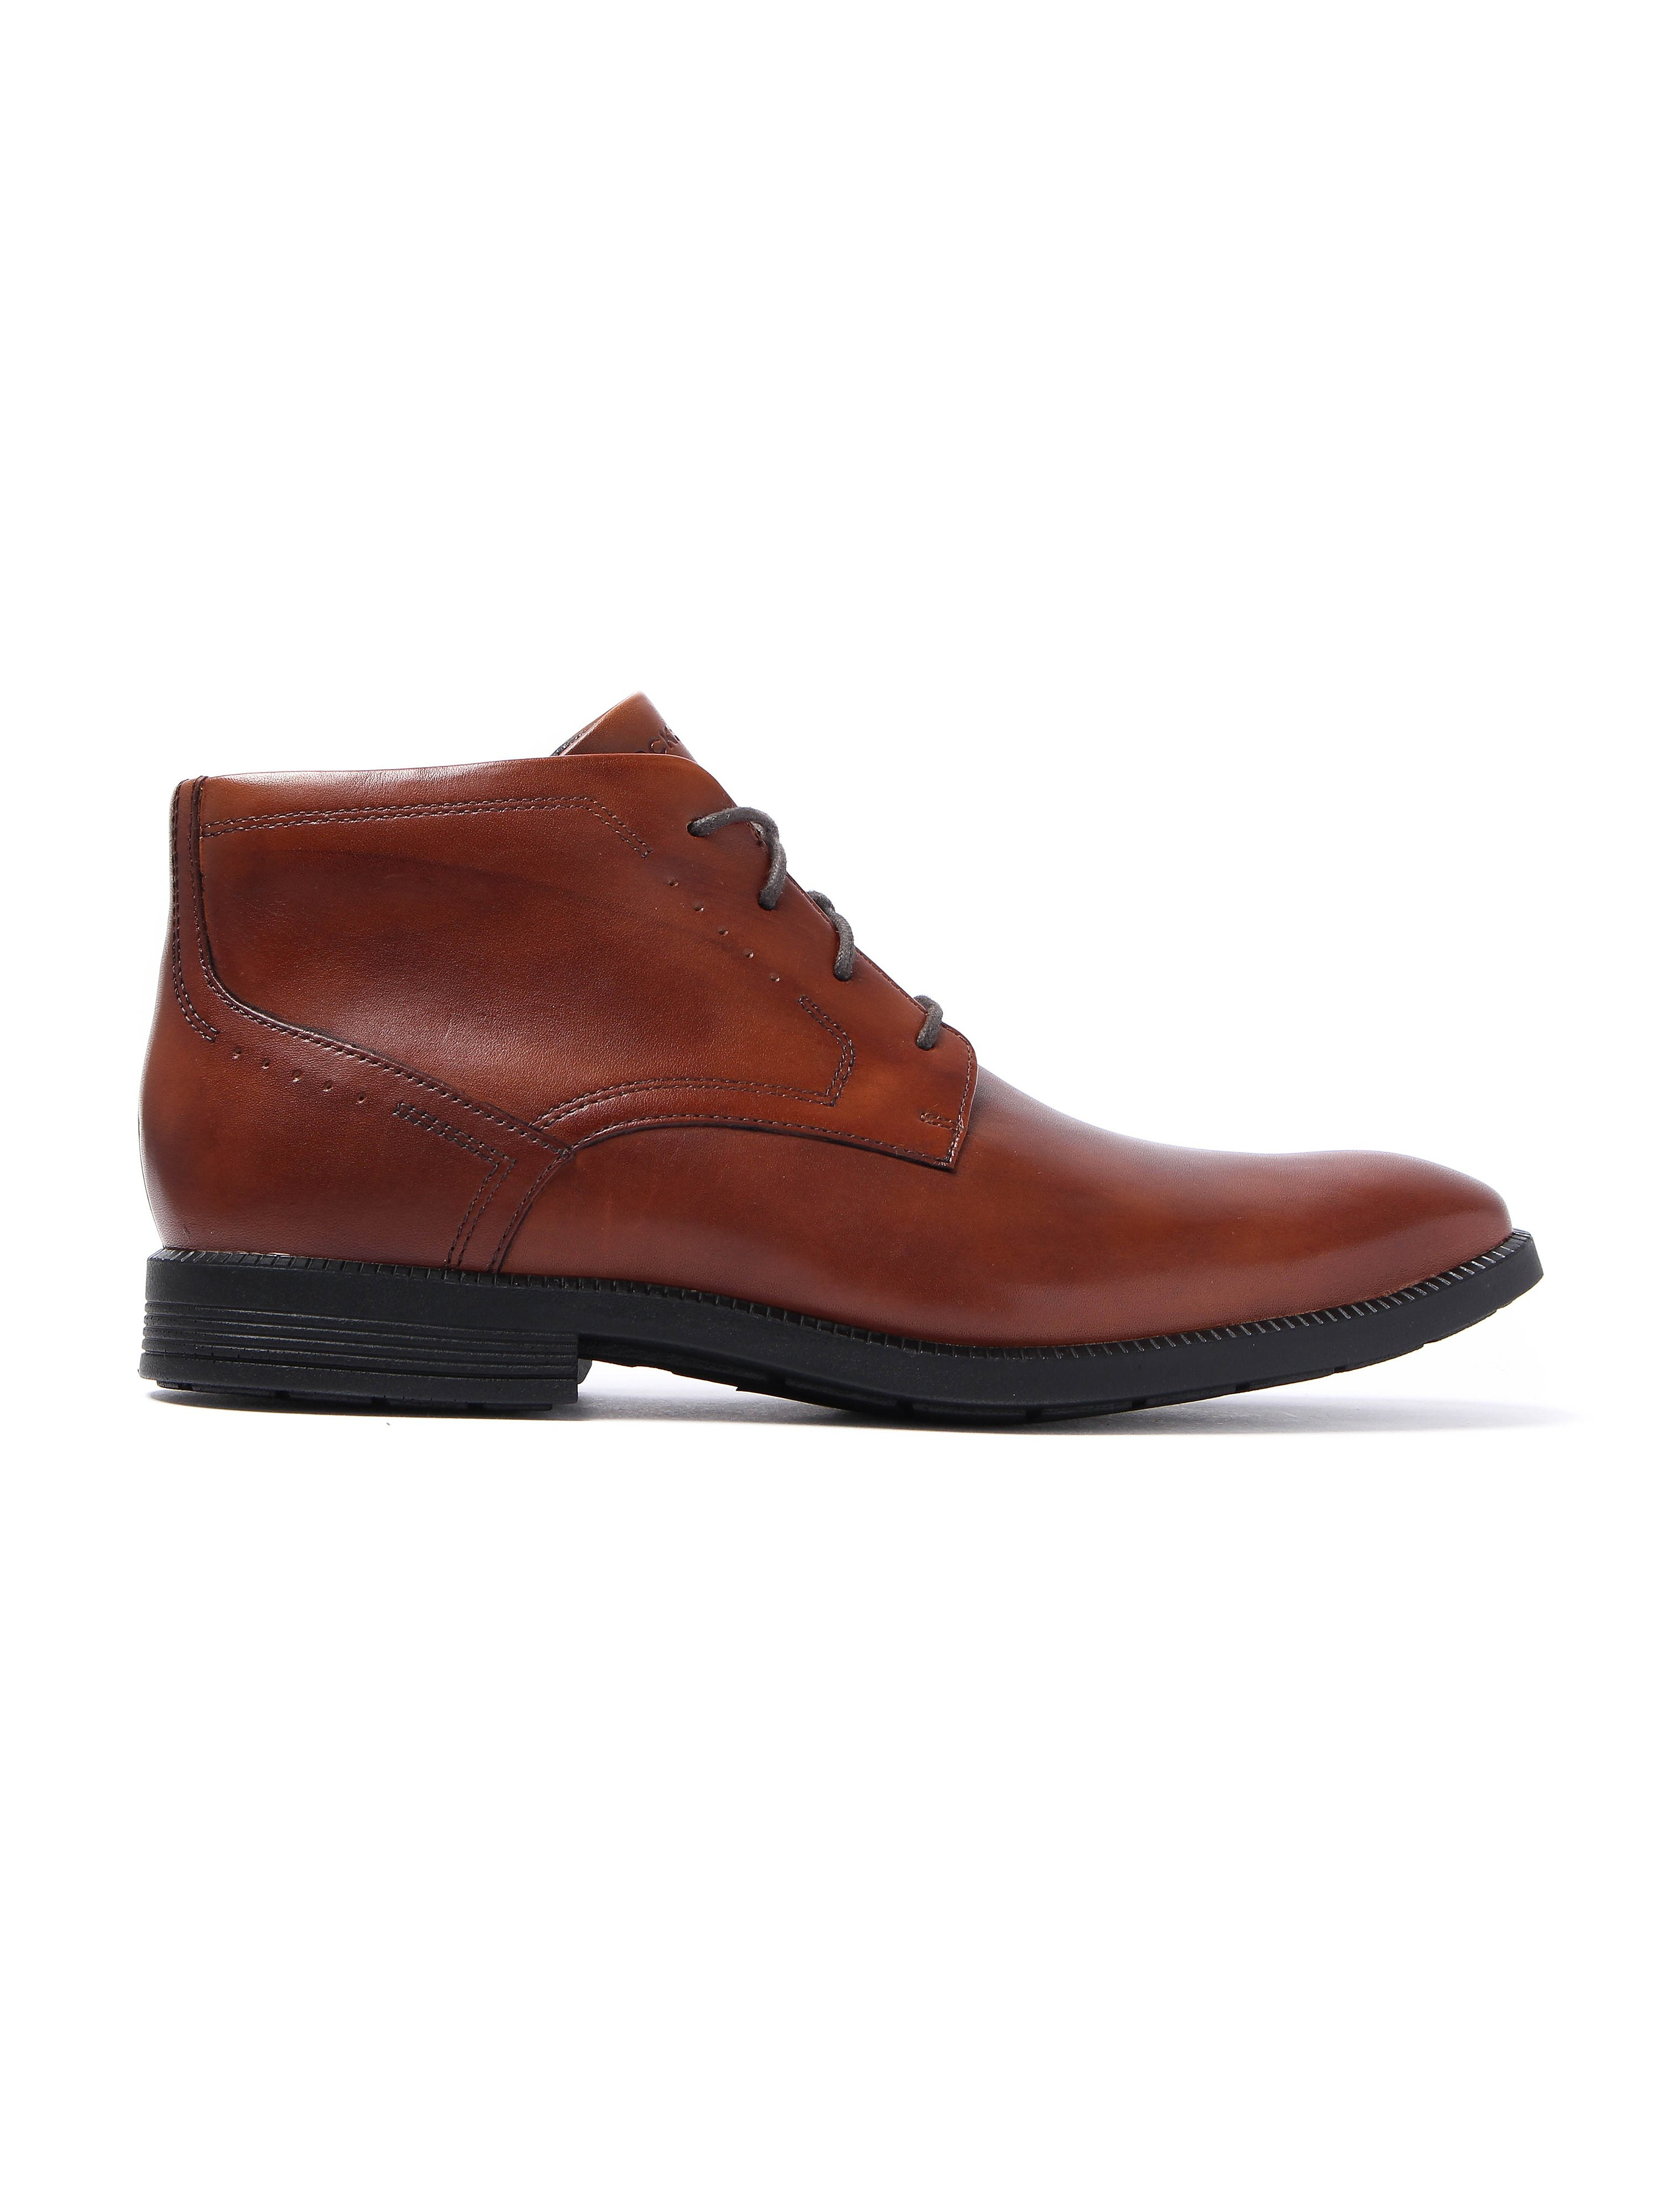 Rockport Modern Chukka Boots - New Brown